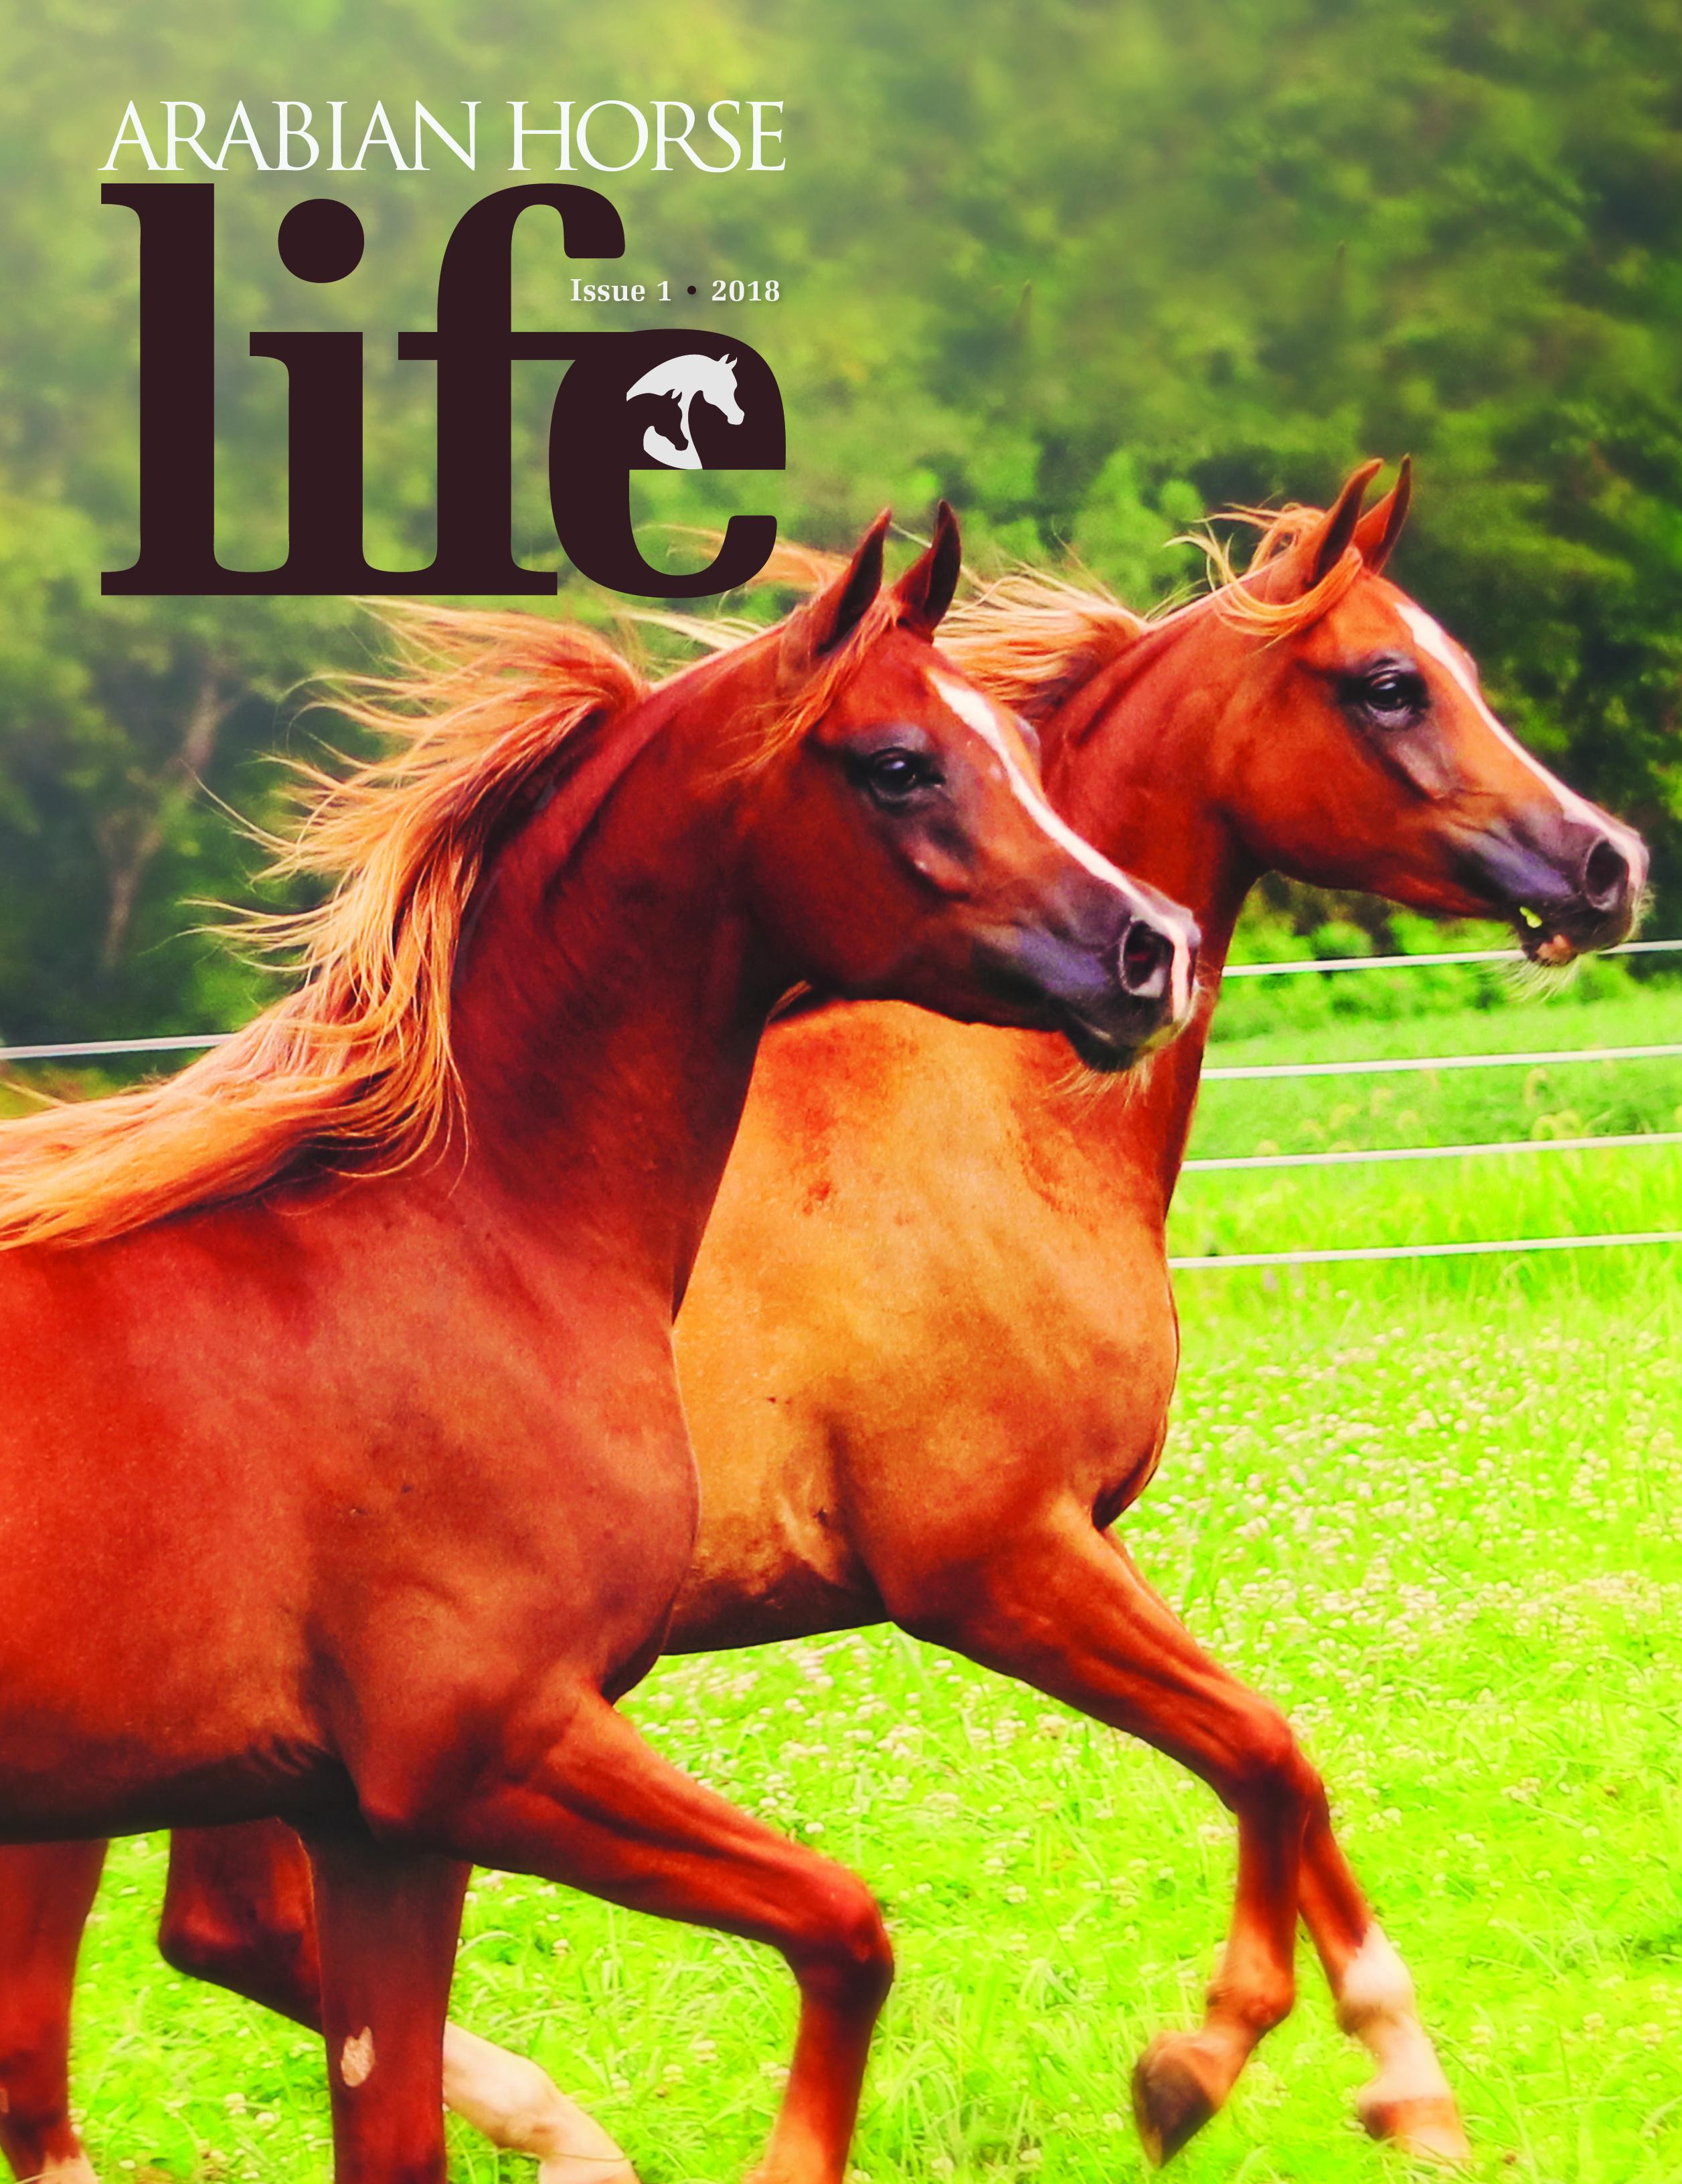 FC-i1 18 COVER